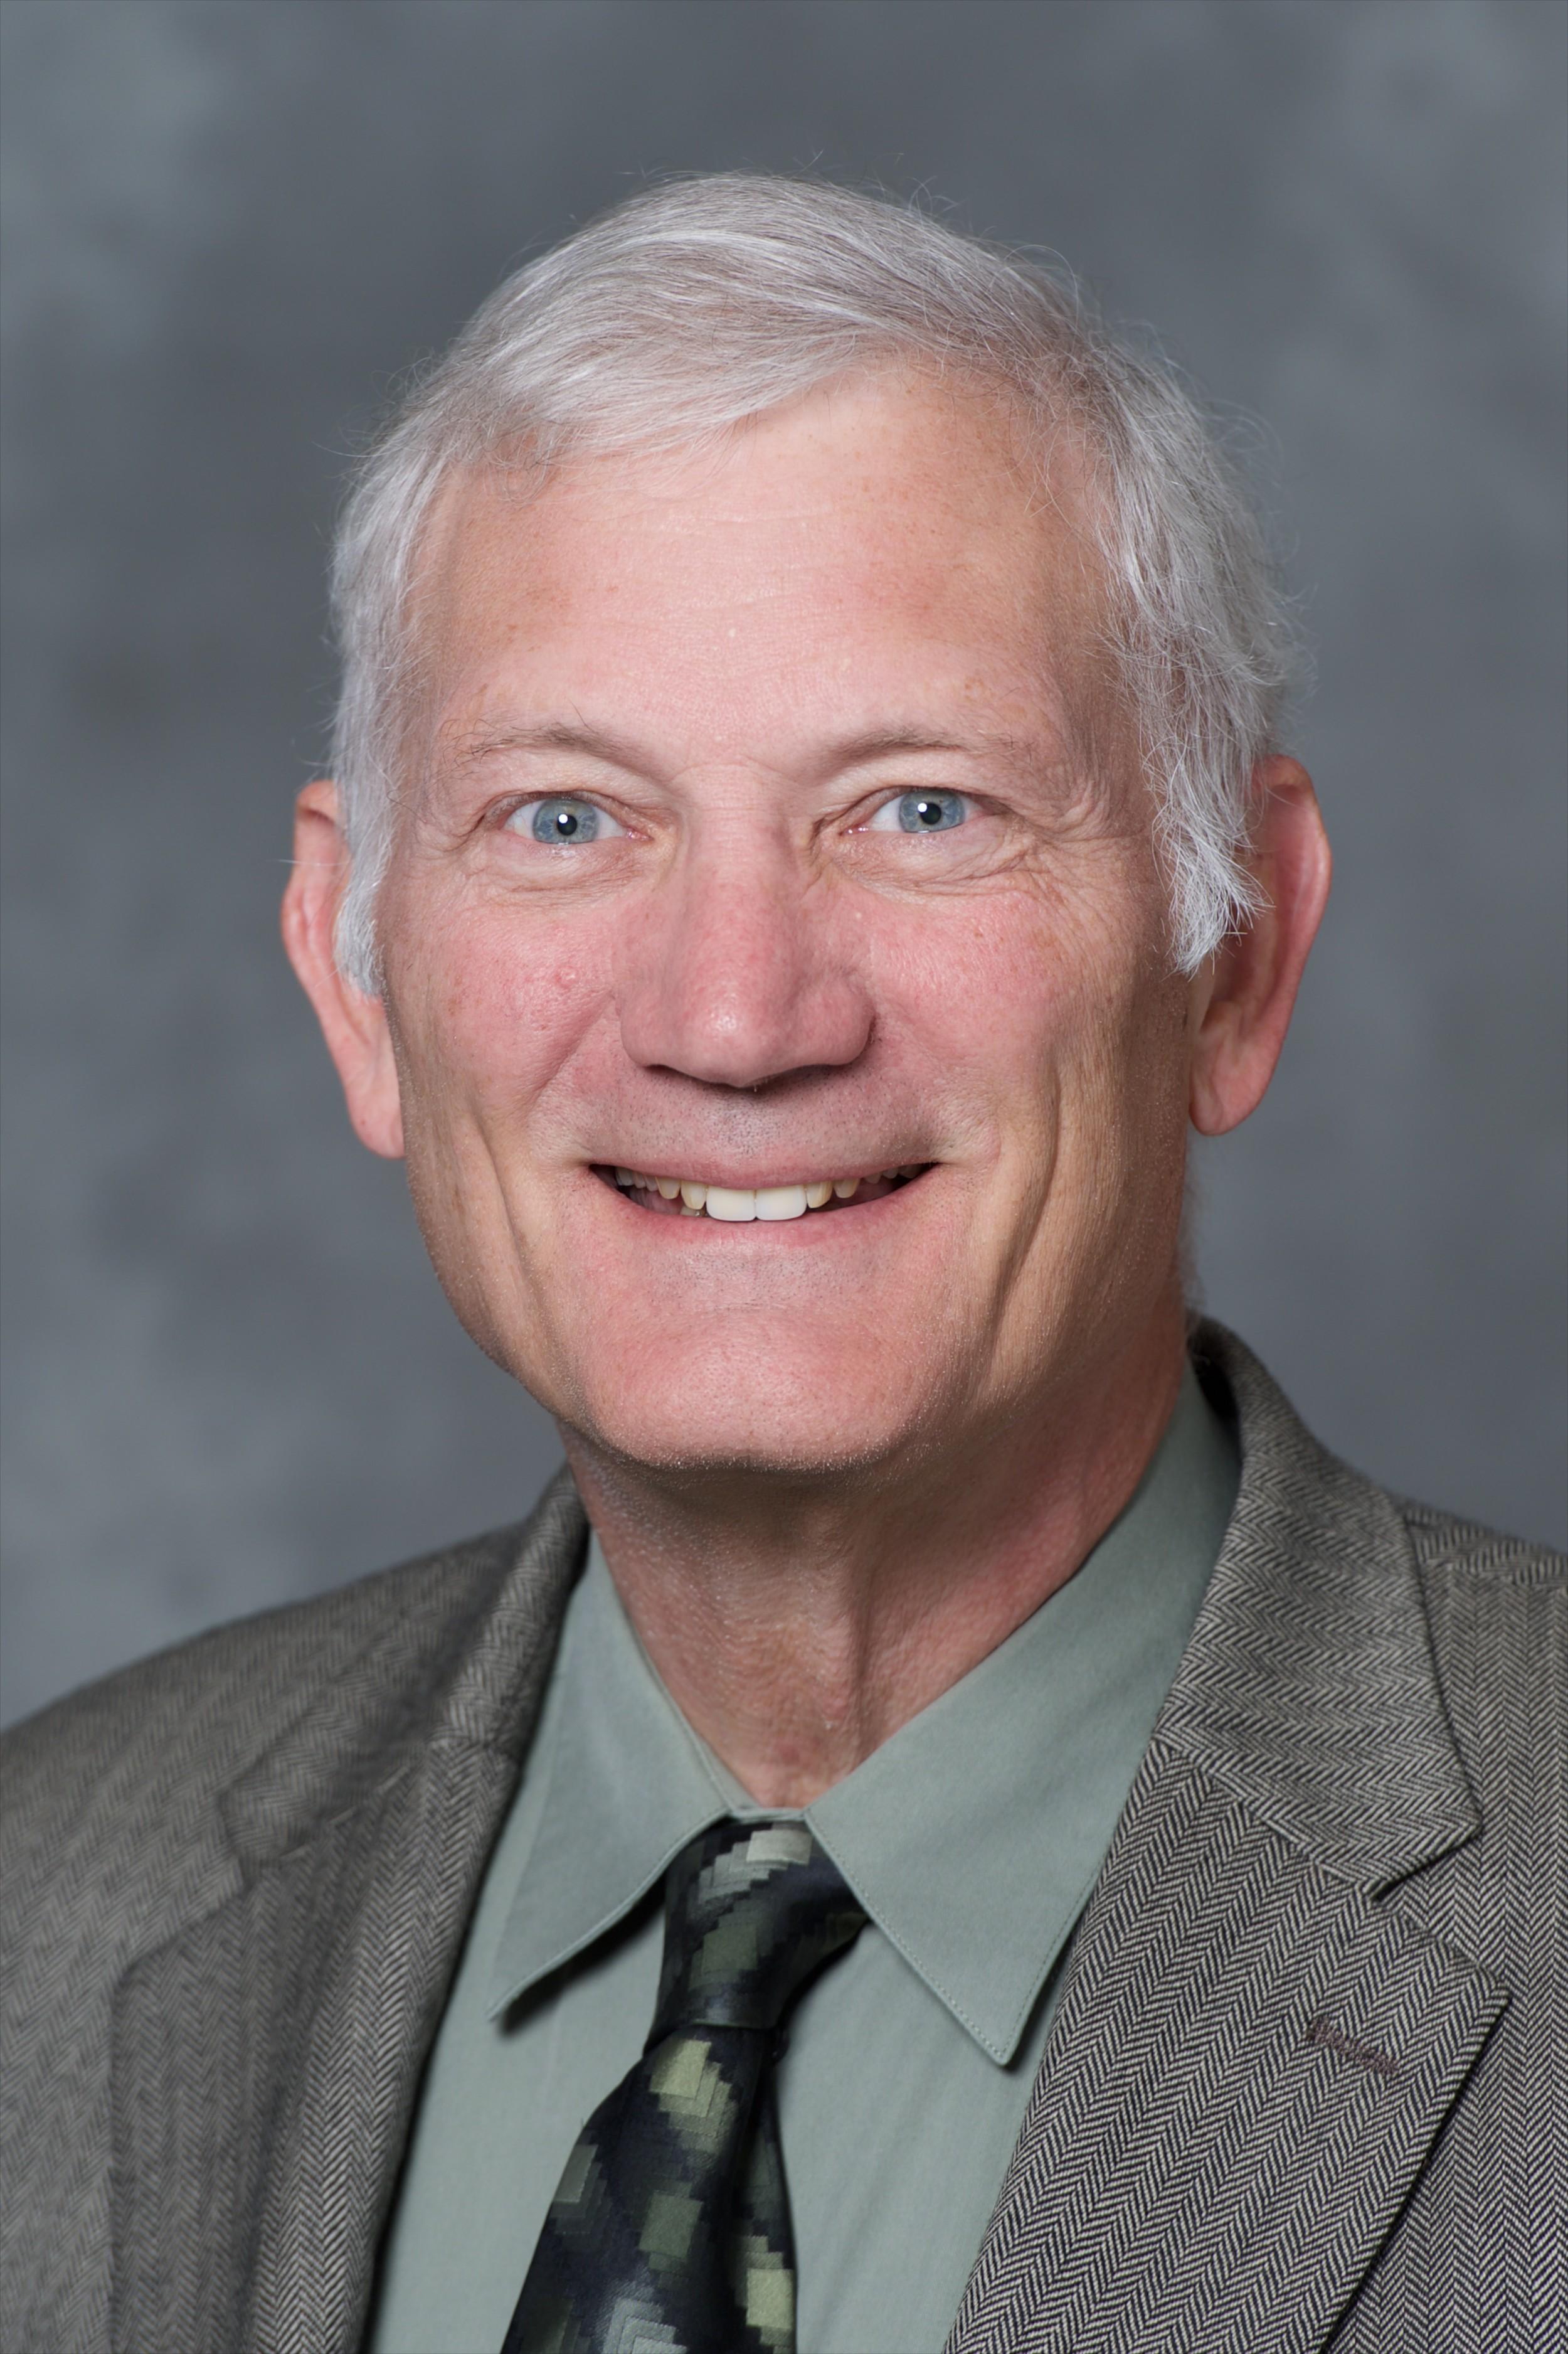 Dr. Greg Wahlberg - Chairman